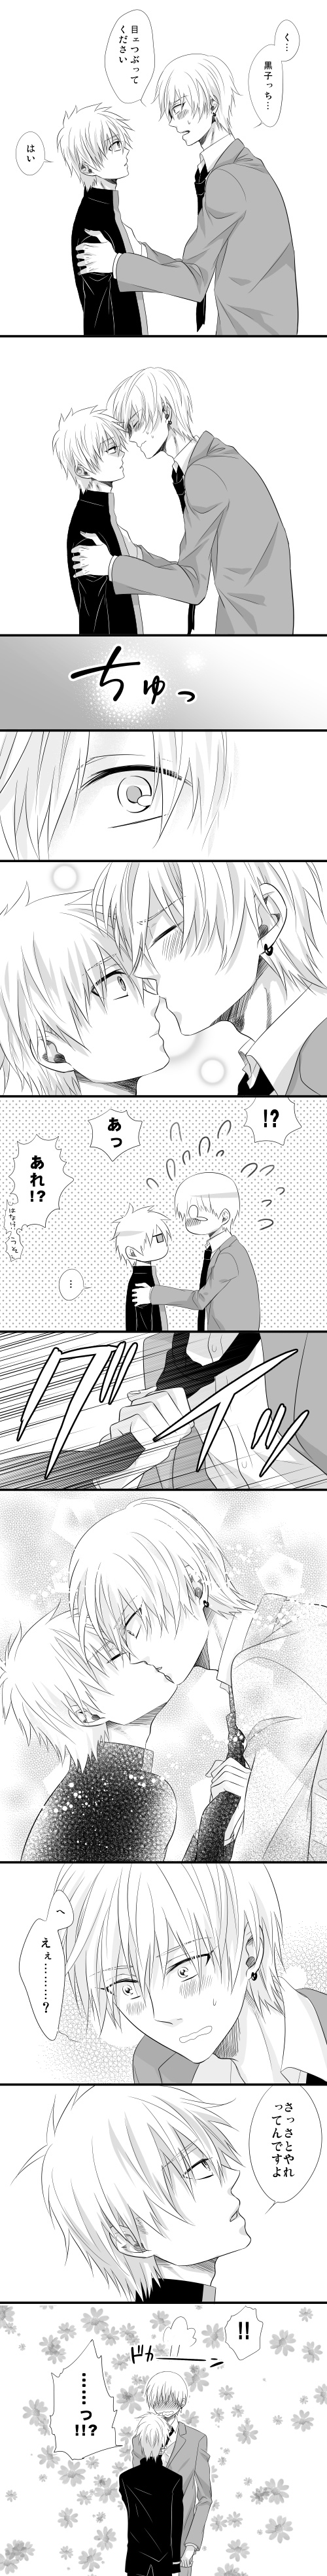 Tags: Anime, Kamu, Kuroko no Basuke, Kuroko Tetsuya, Kise Ryouta, Pixiv, Comic, Translated, Kuroko's Basketball